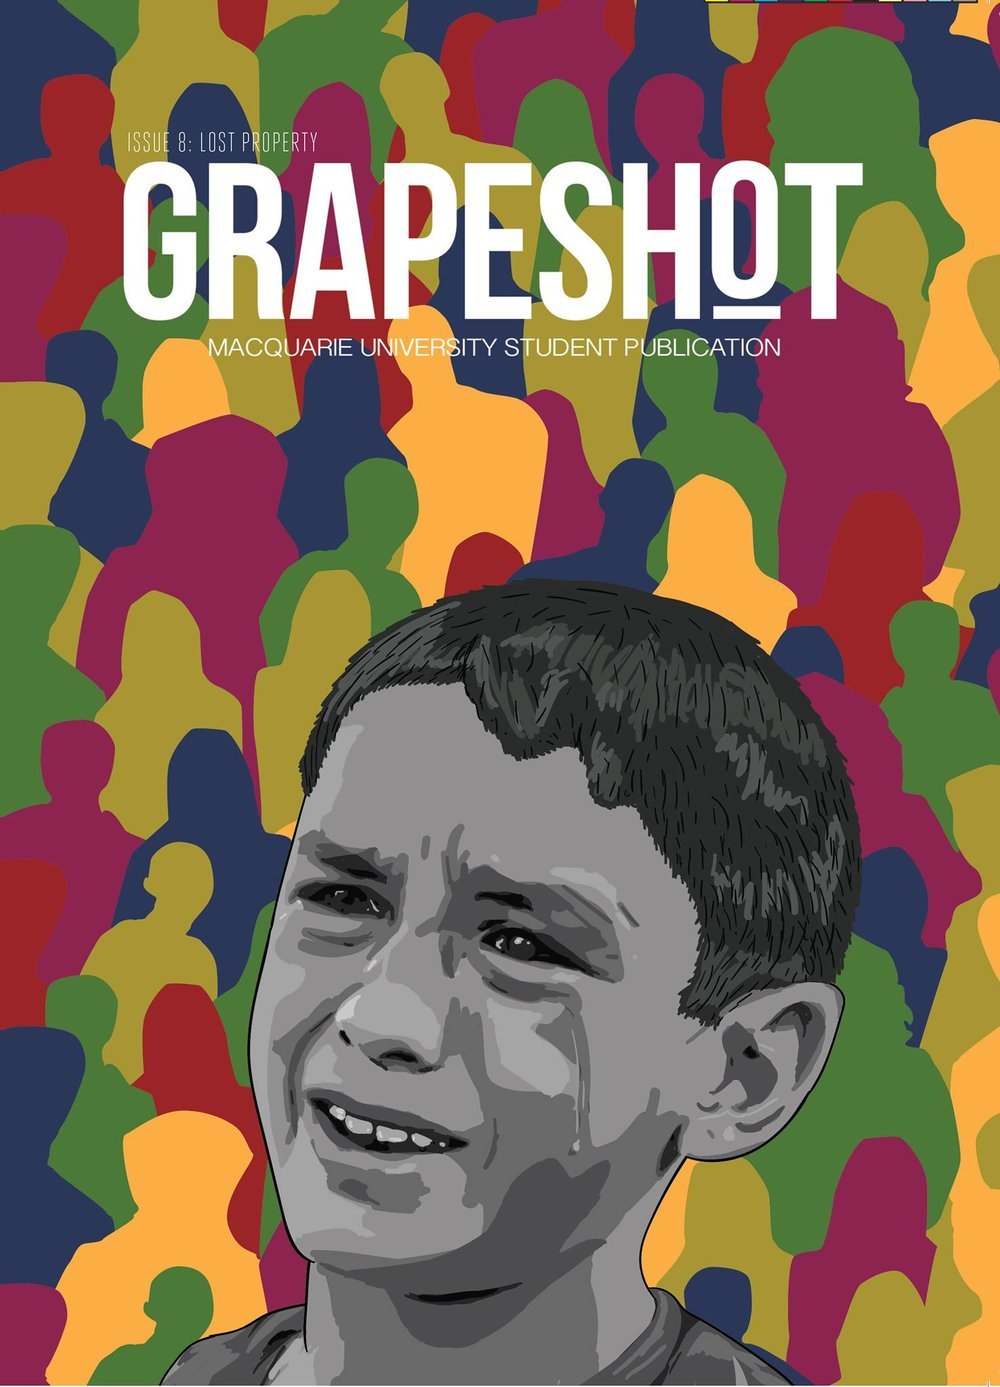 Cover Illustration by Sam van Vliet